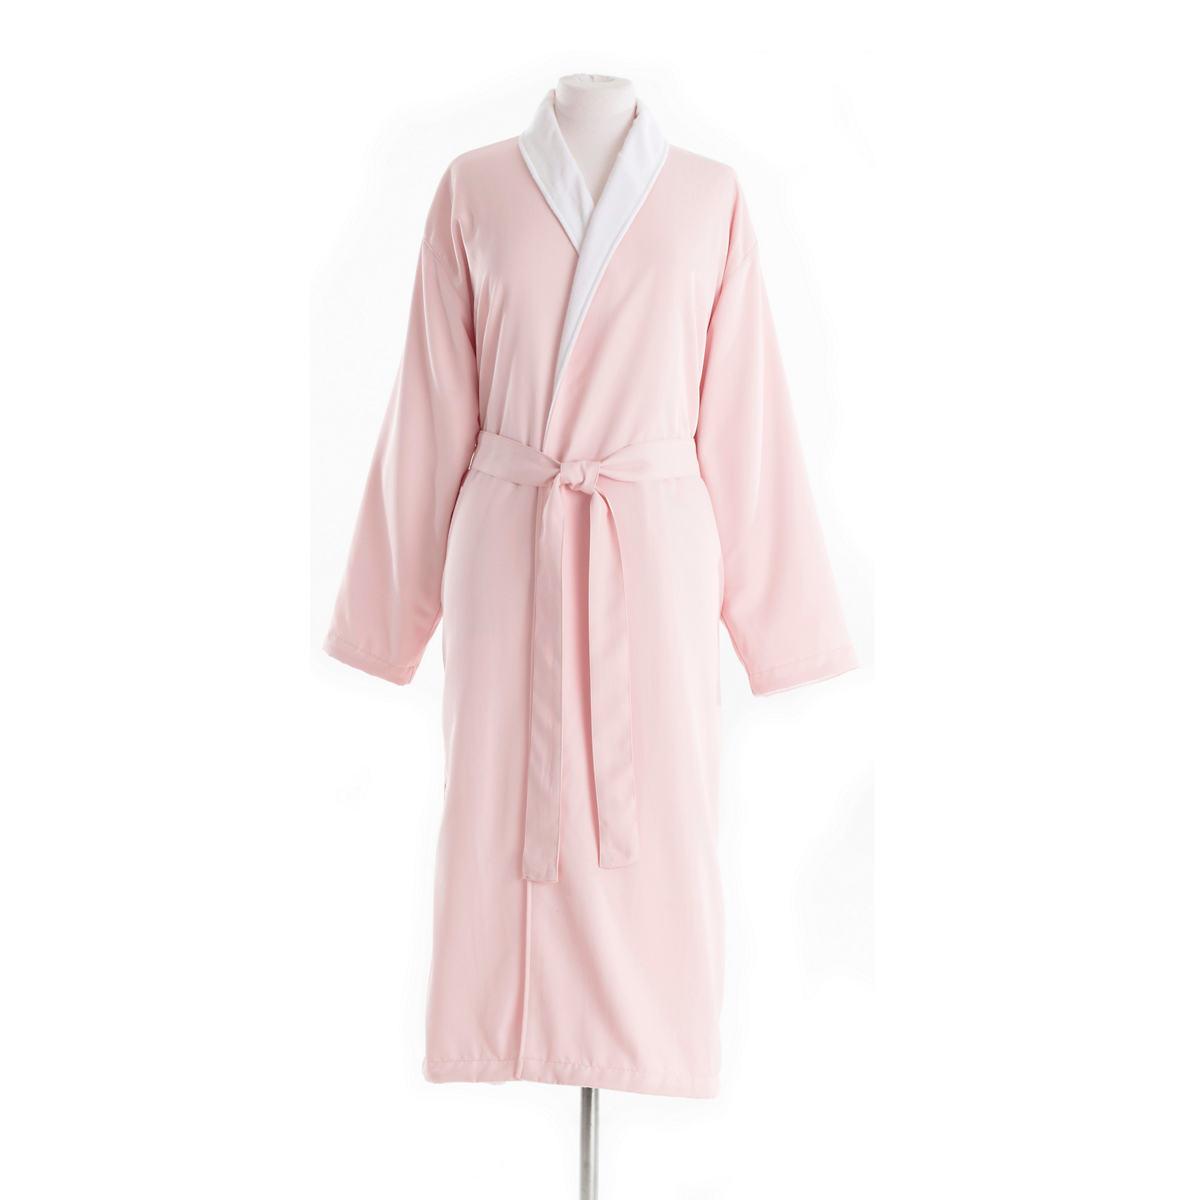 Harlow Pink Robe